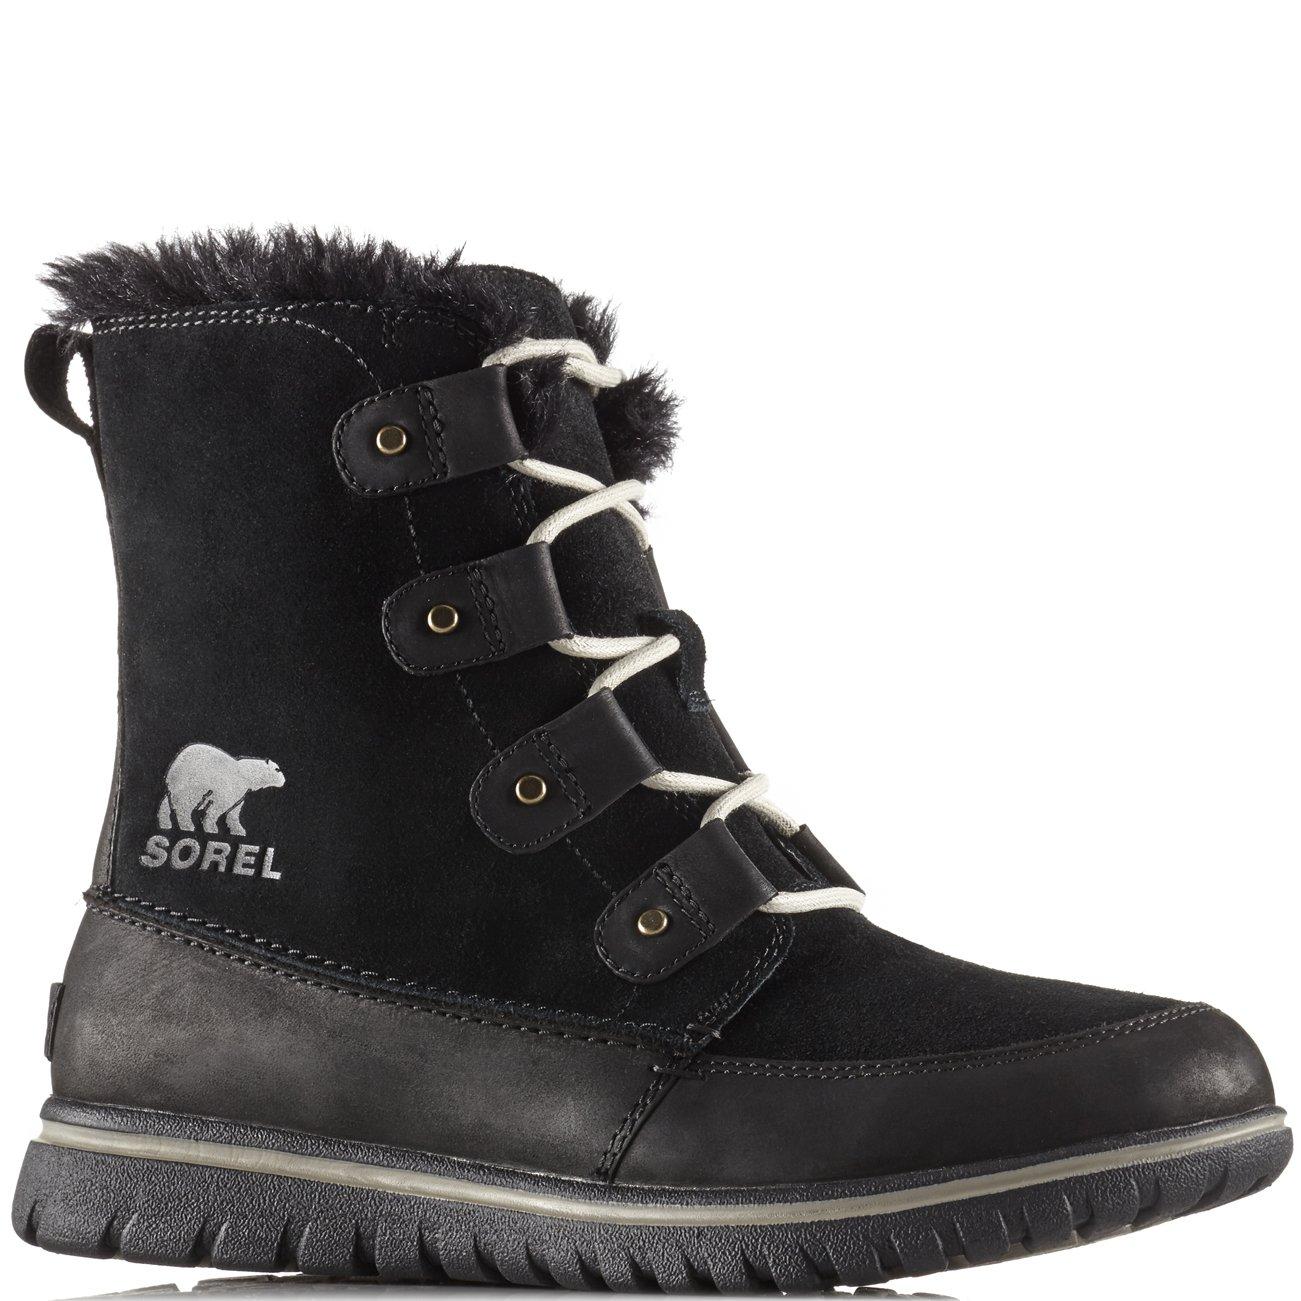 Sorel Womens Cozy Joan Black Leather Boots 10 US